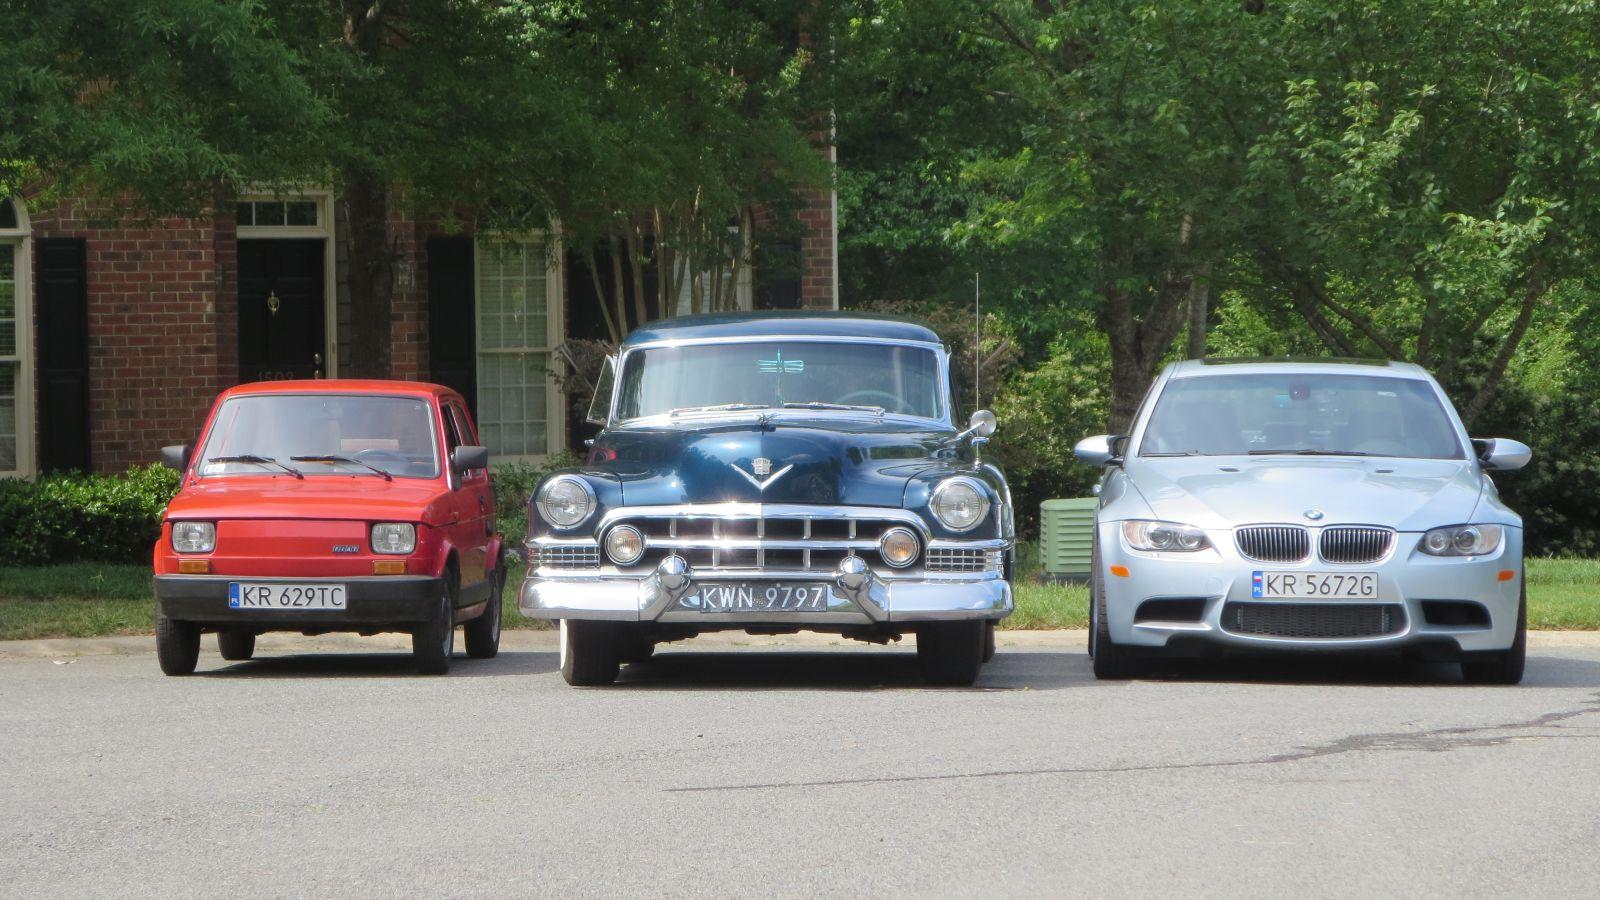 51 Cadillac Series 62 Sedan Antique Automobile Club Of America 1951 Img 2421